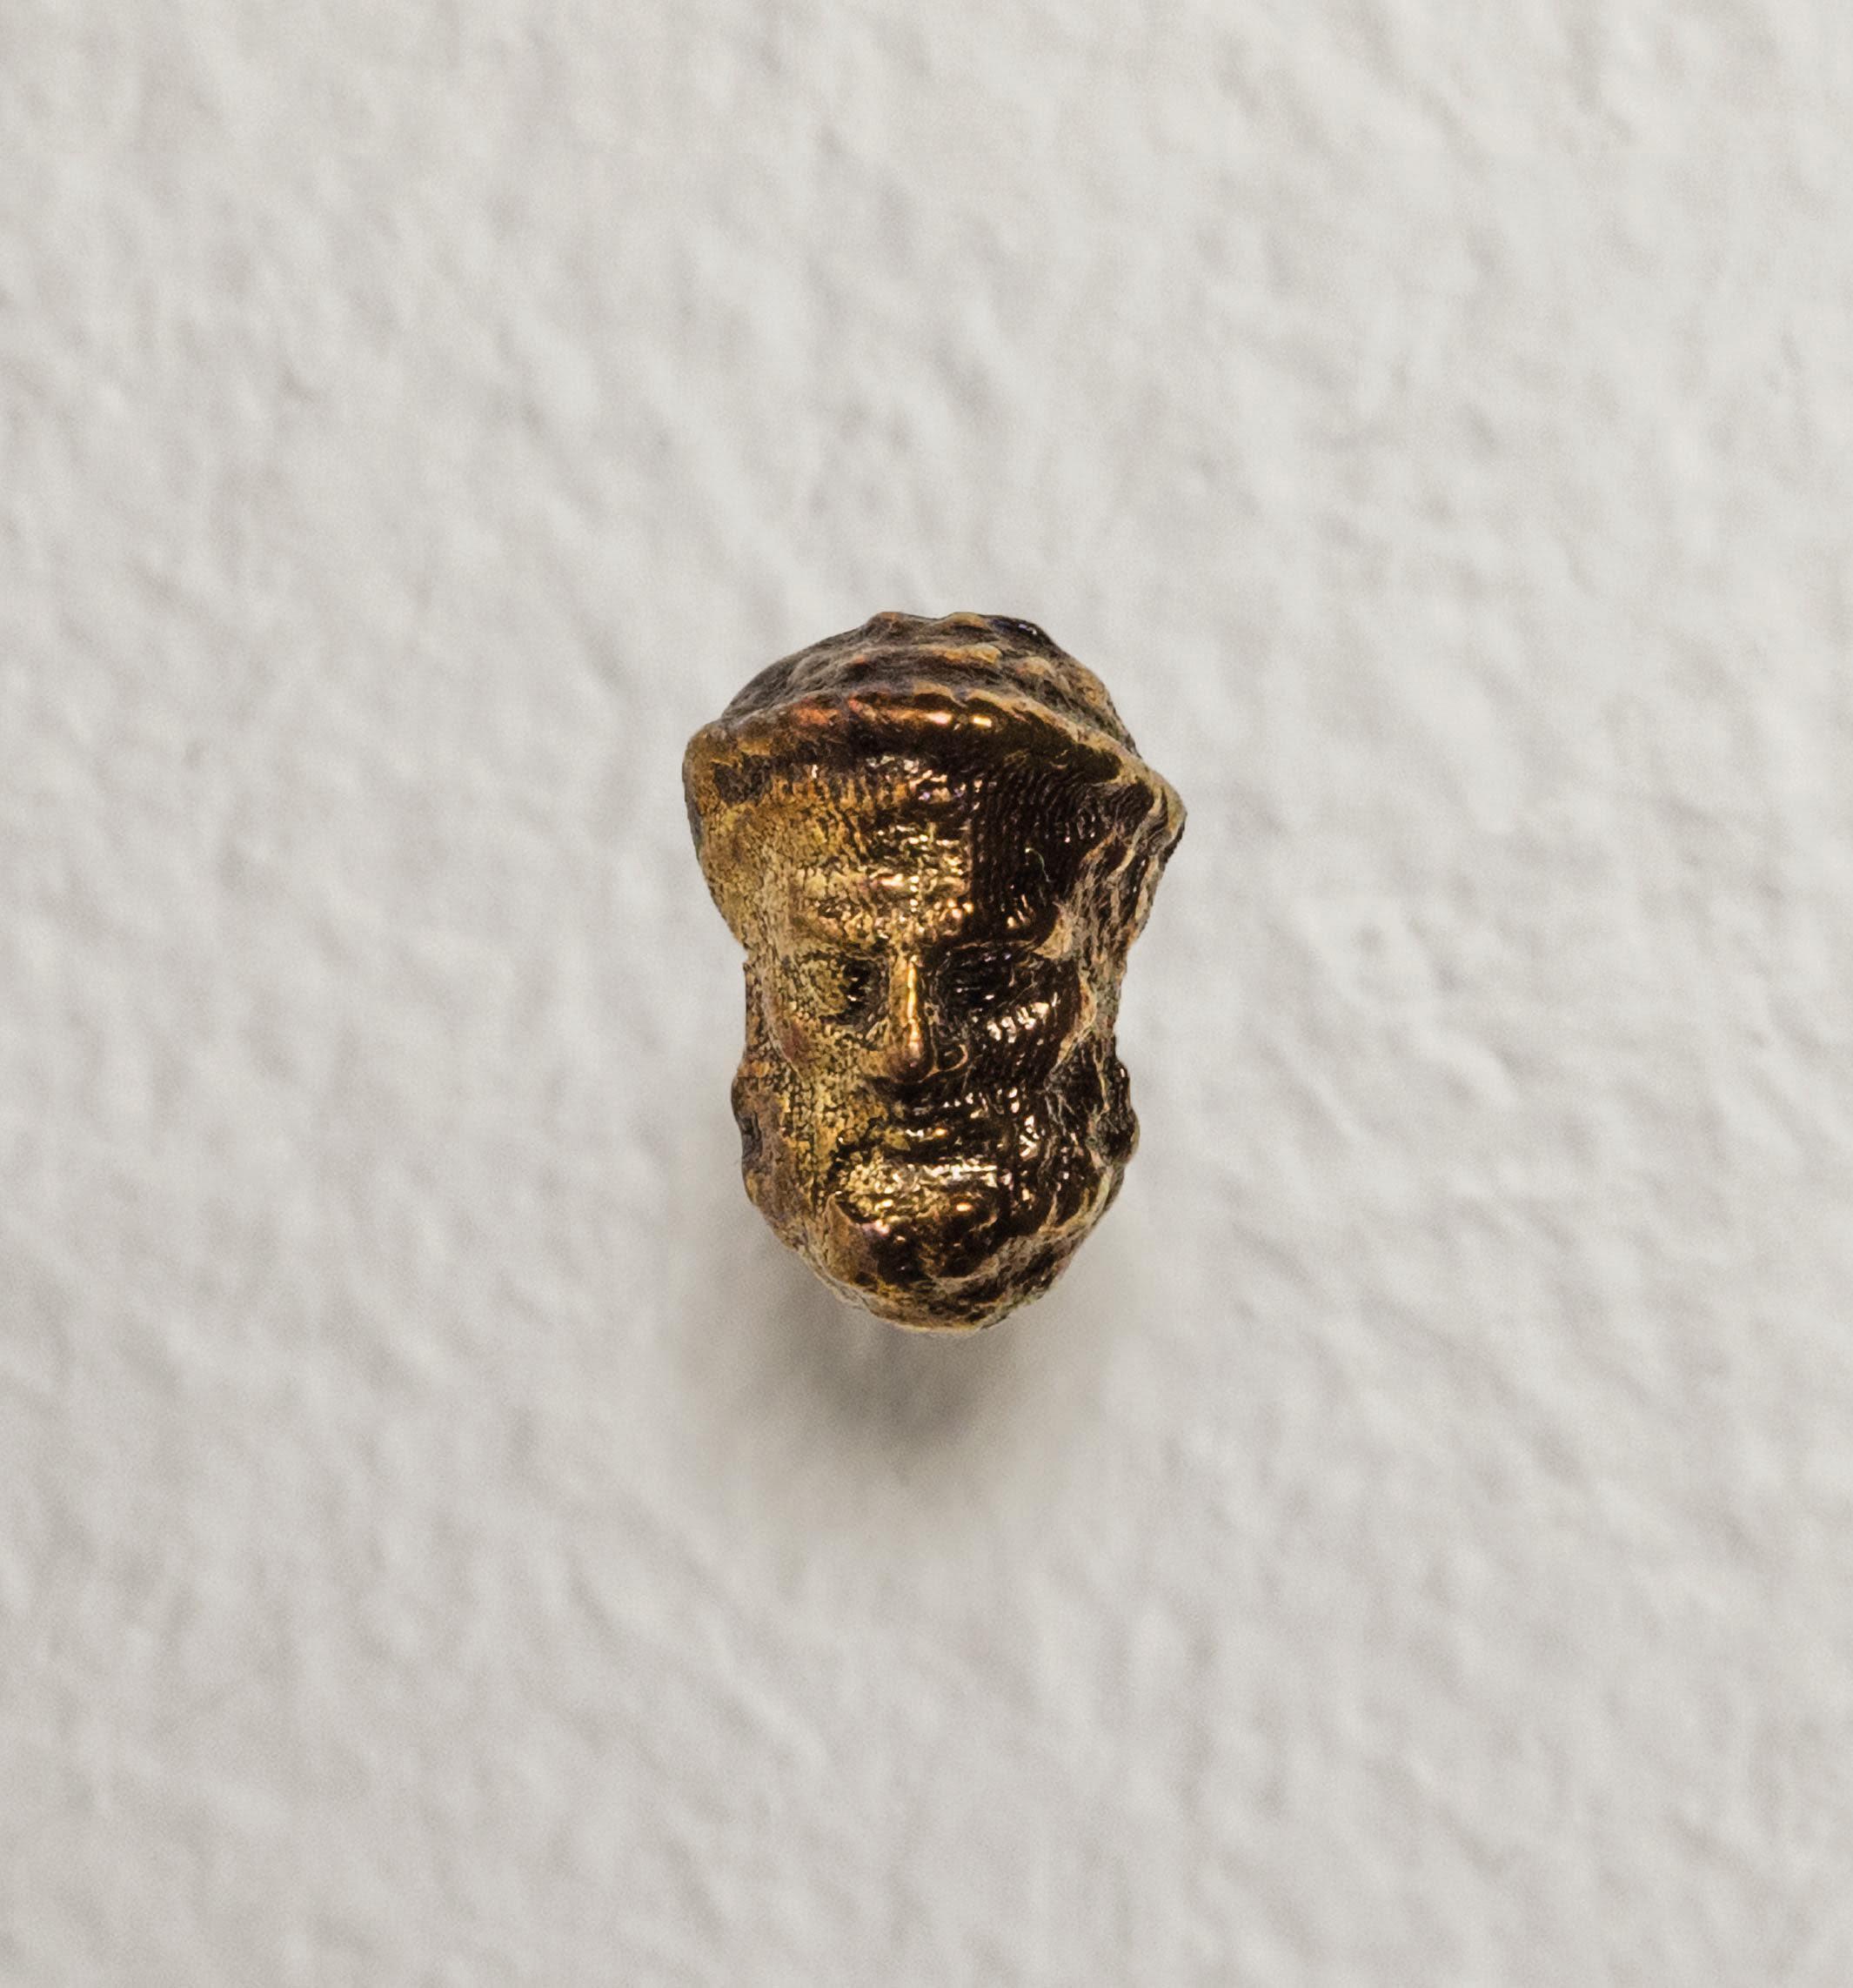 """Platone (I filosofi)"" 2016, bronzo, 8 x 22 x 5 mm"